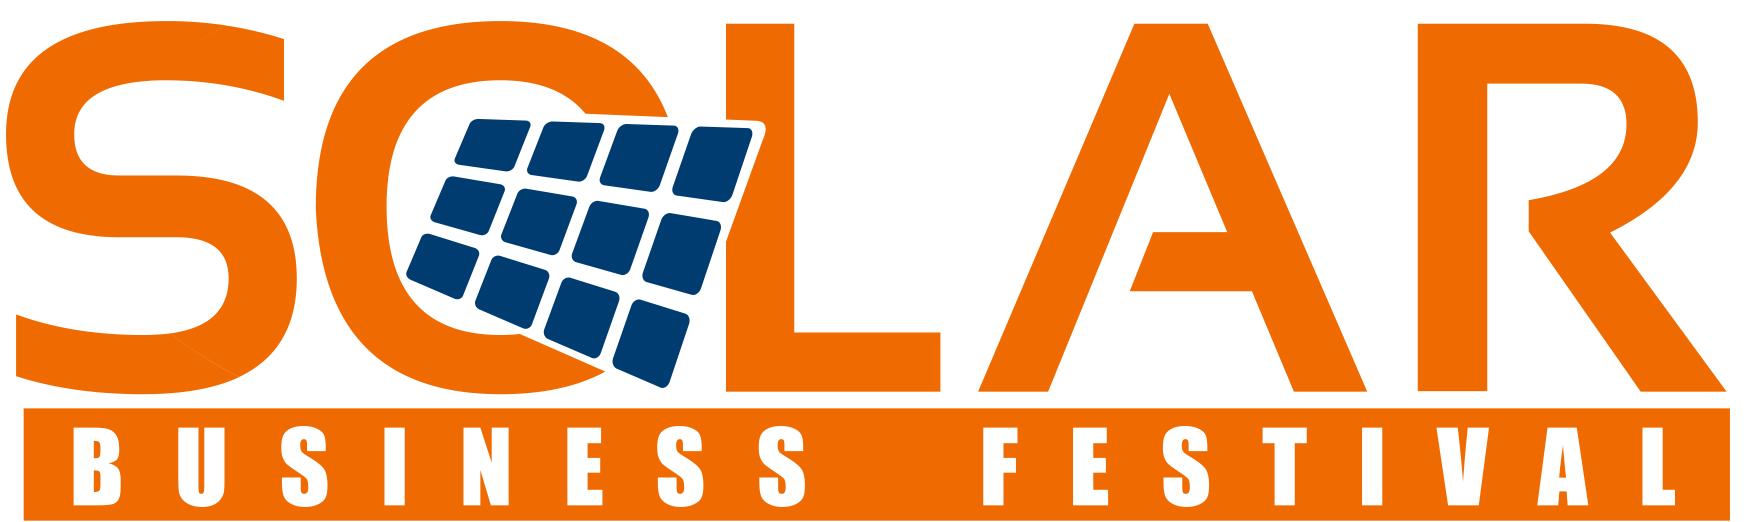 Solar Business Festival 2016 Tickets Fri Dec 2 2016 At